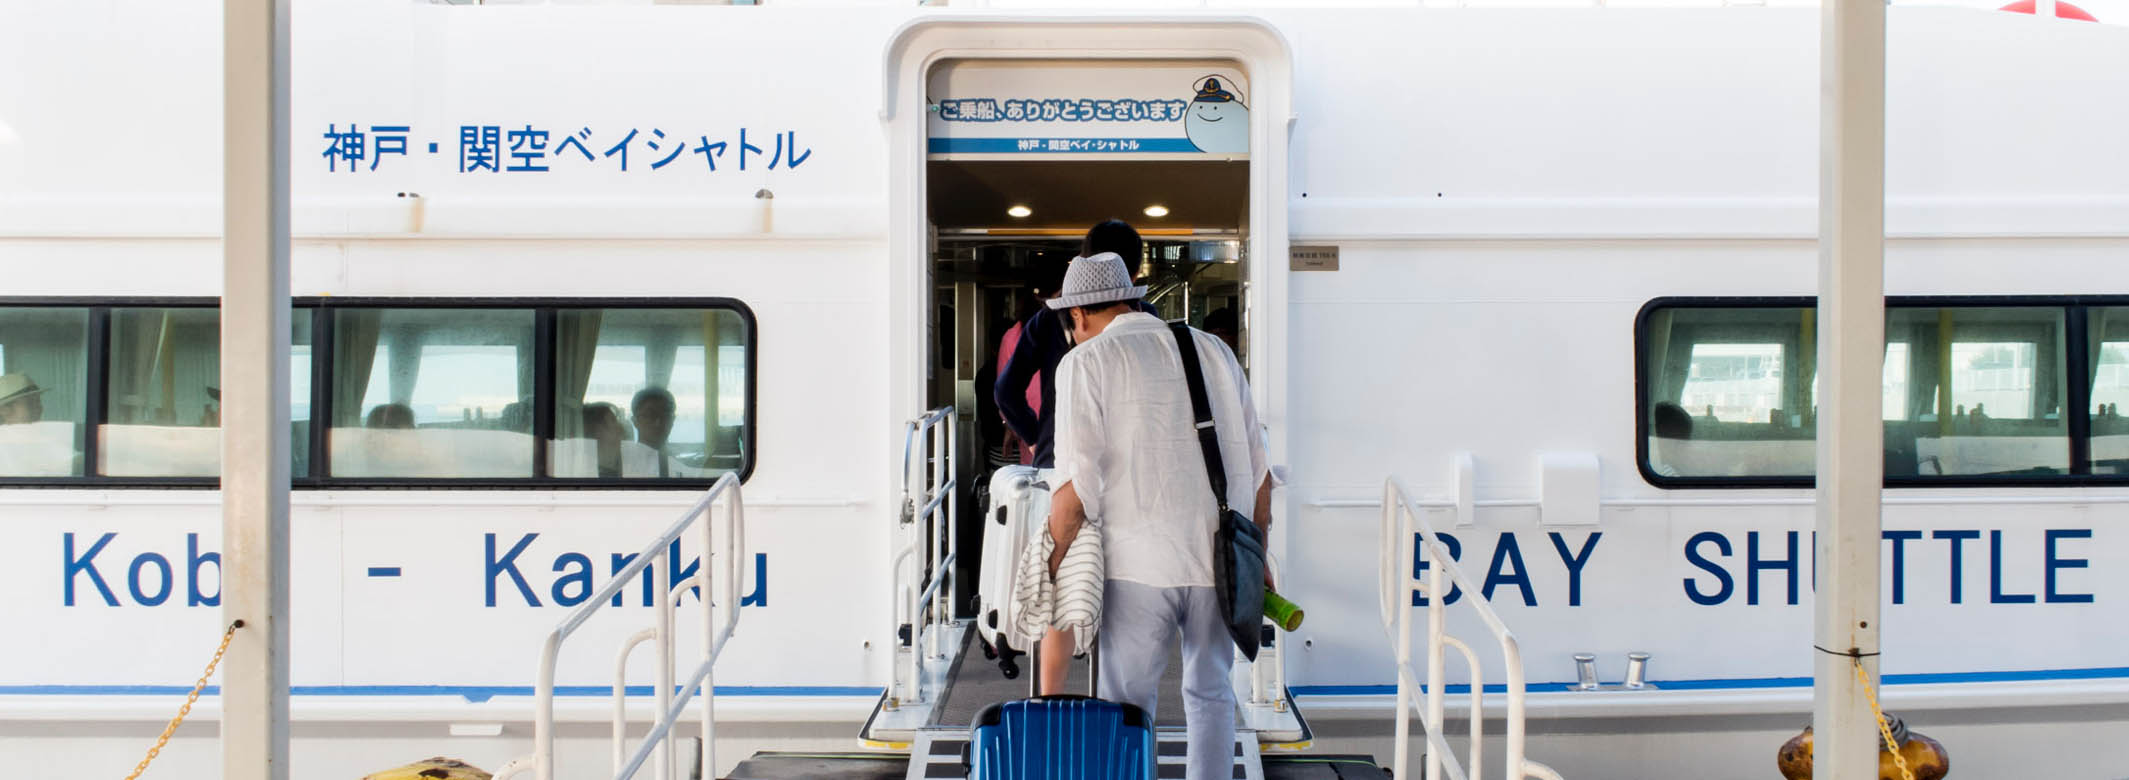 Taking the Kobe-Kansai Bay Shuttle Ferry from Kobe to Osaka Kansai Airport